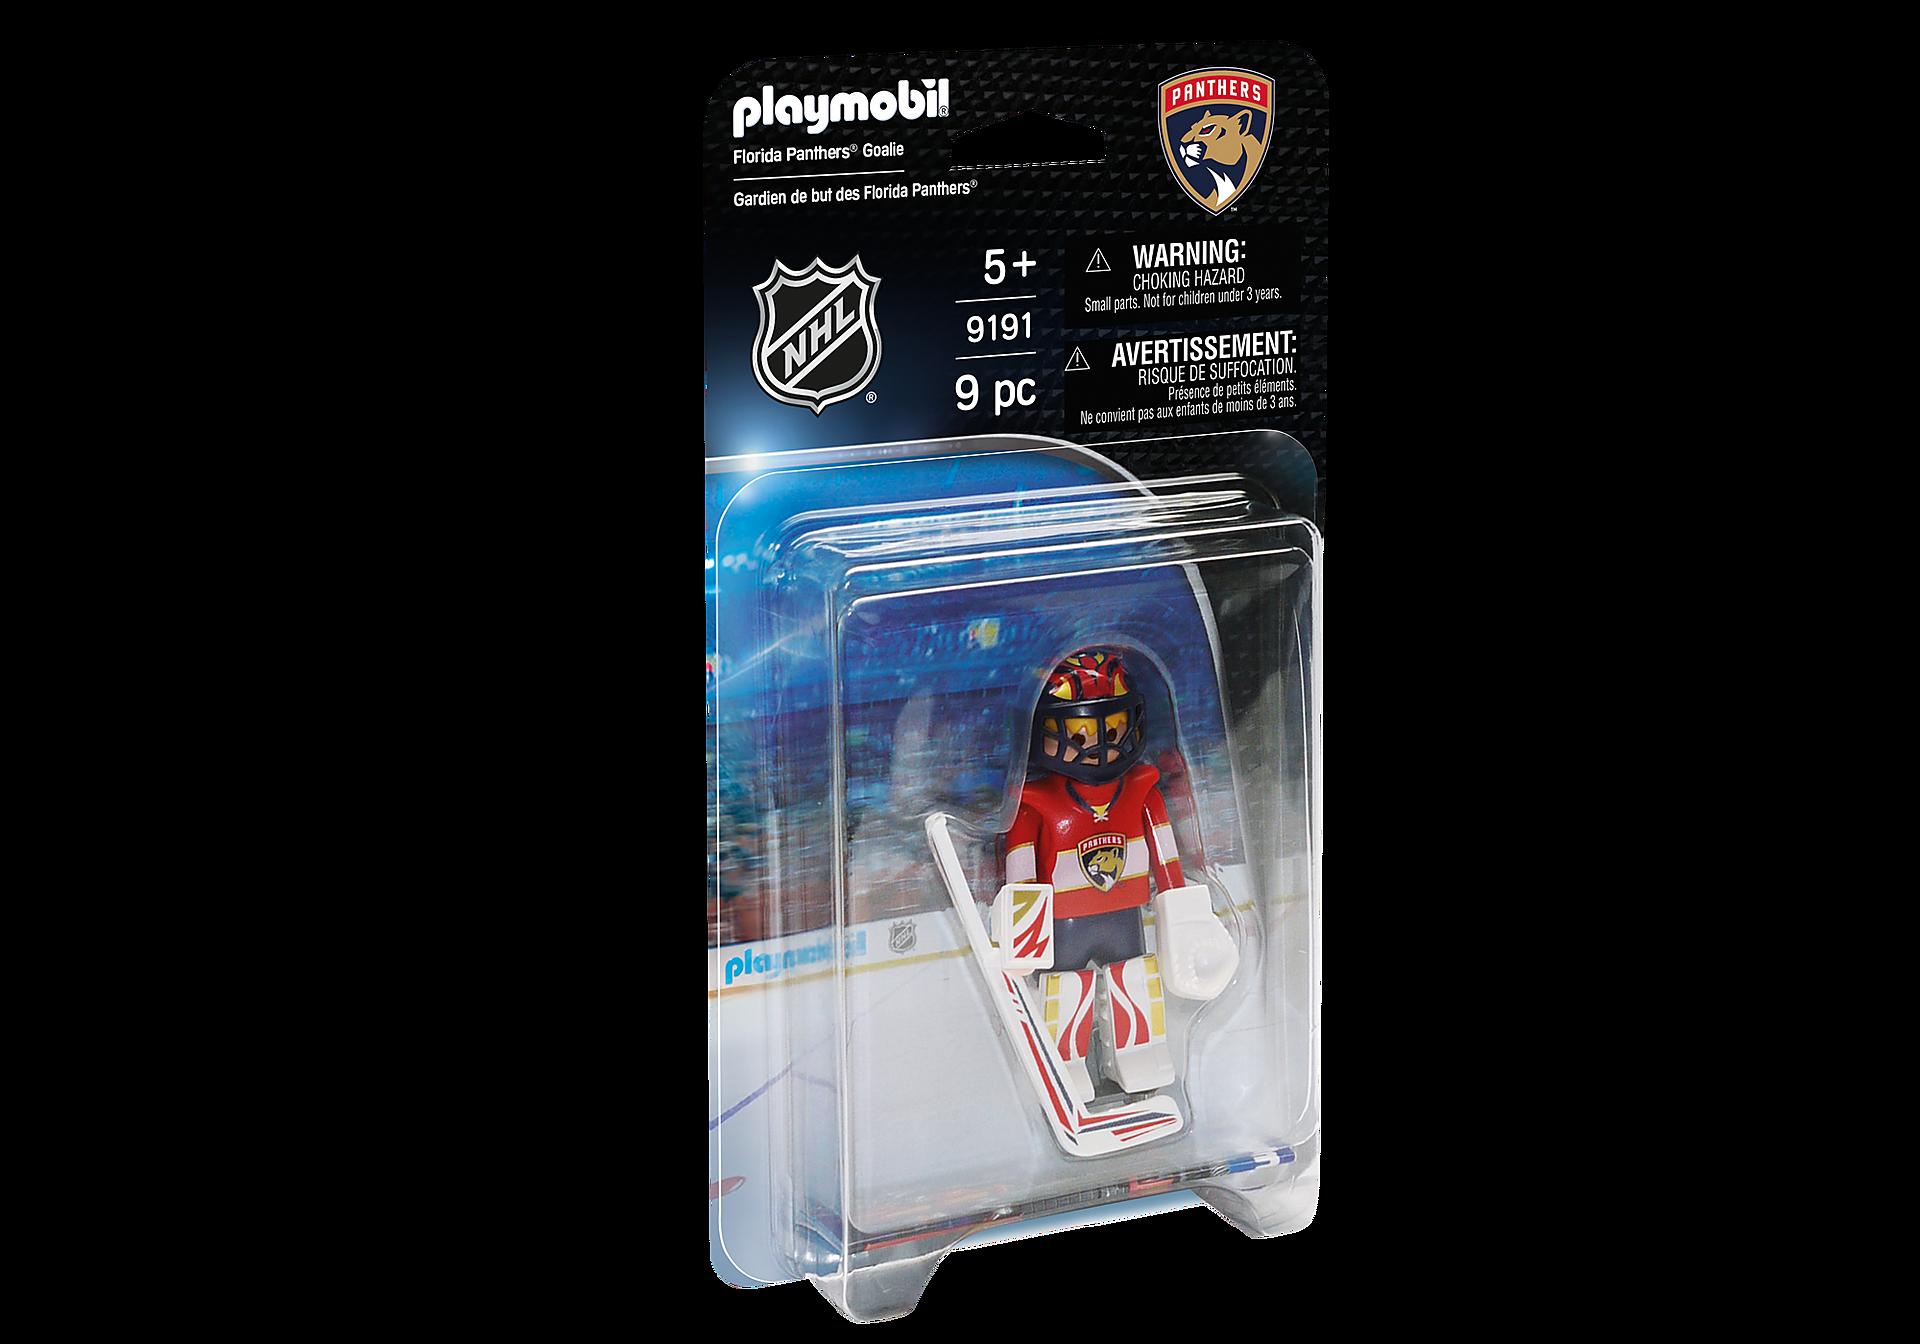 http://media.playmobil.com/i/playmobil/9191_product_box_front/NHL™ Florida Panthers™ Goalie